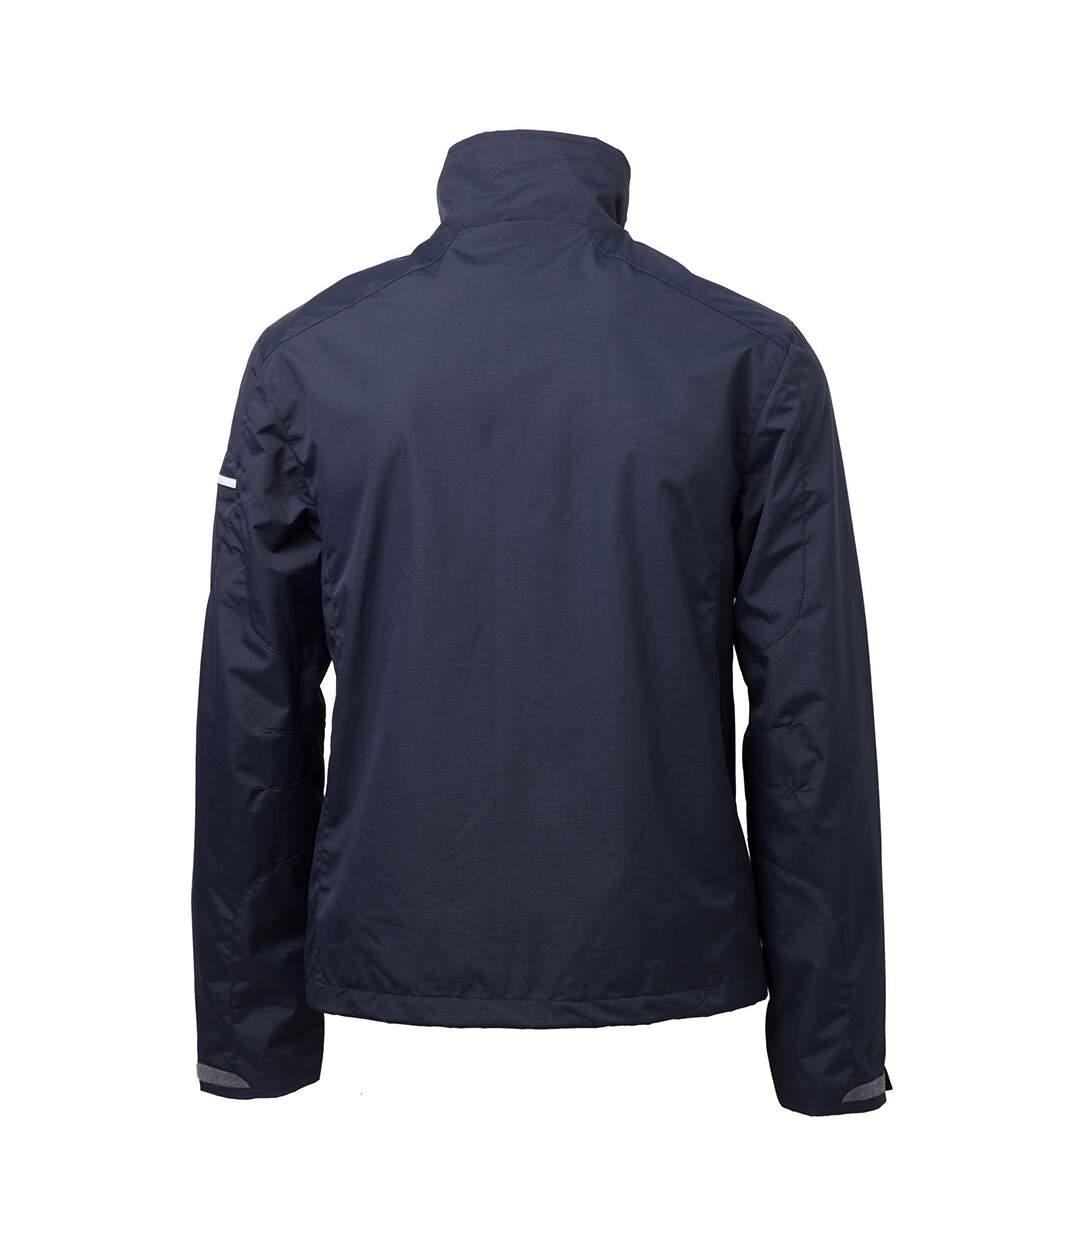 Nimbus Mens Providence Windproof Waterproof Jacket (Navy) - UTRW918